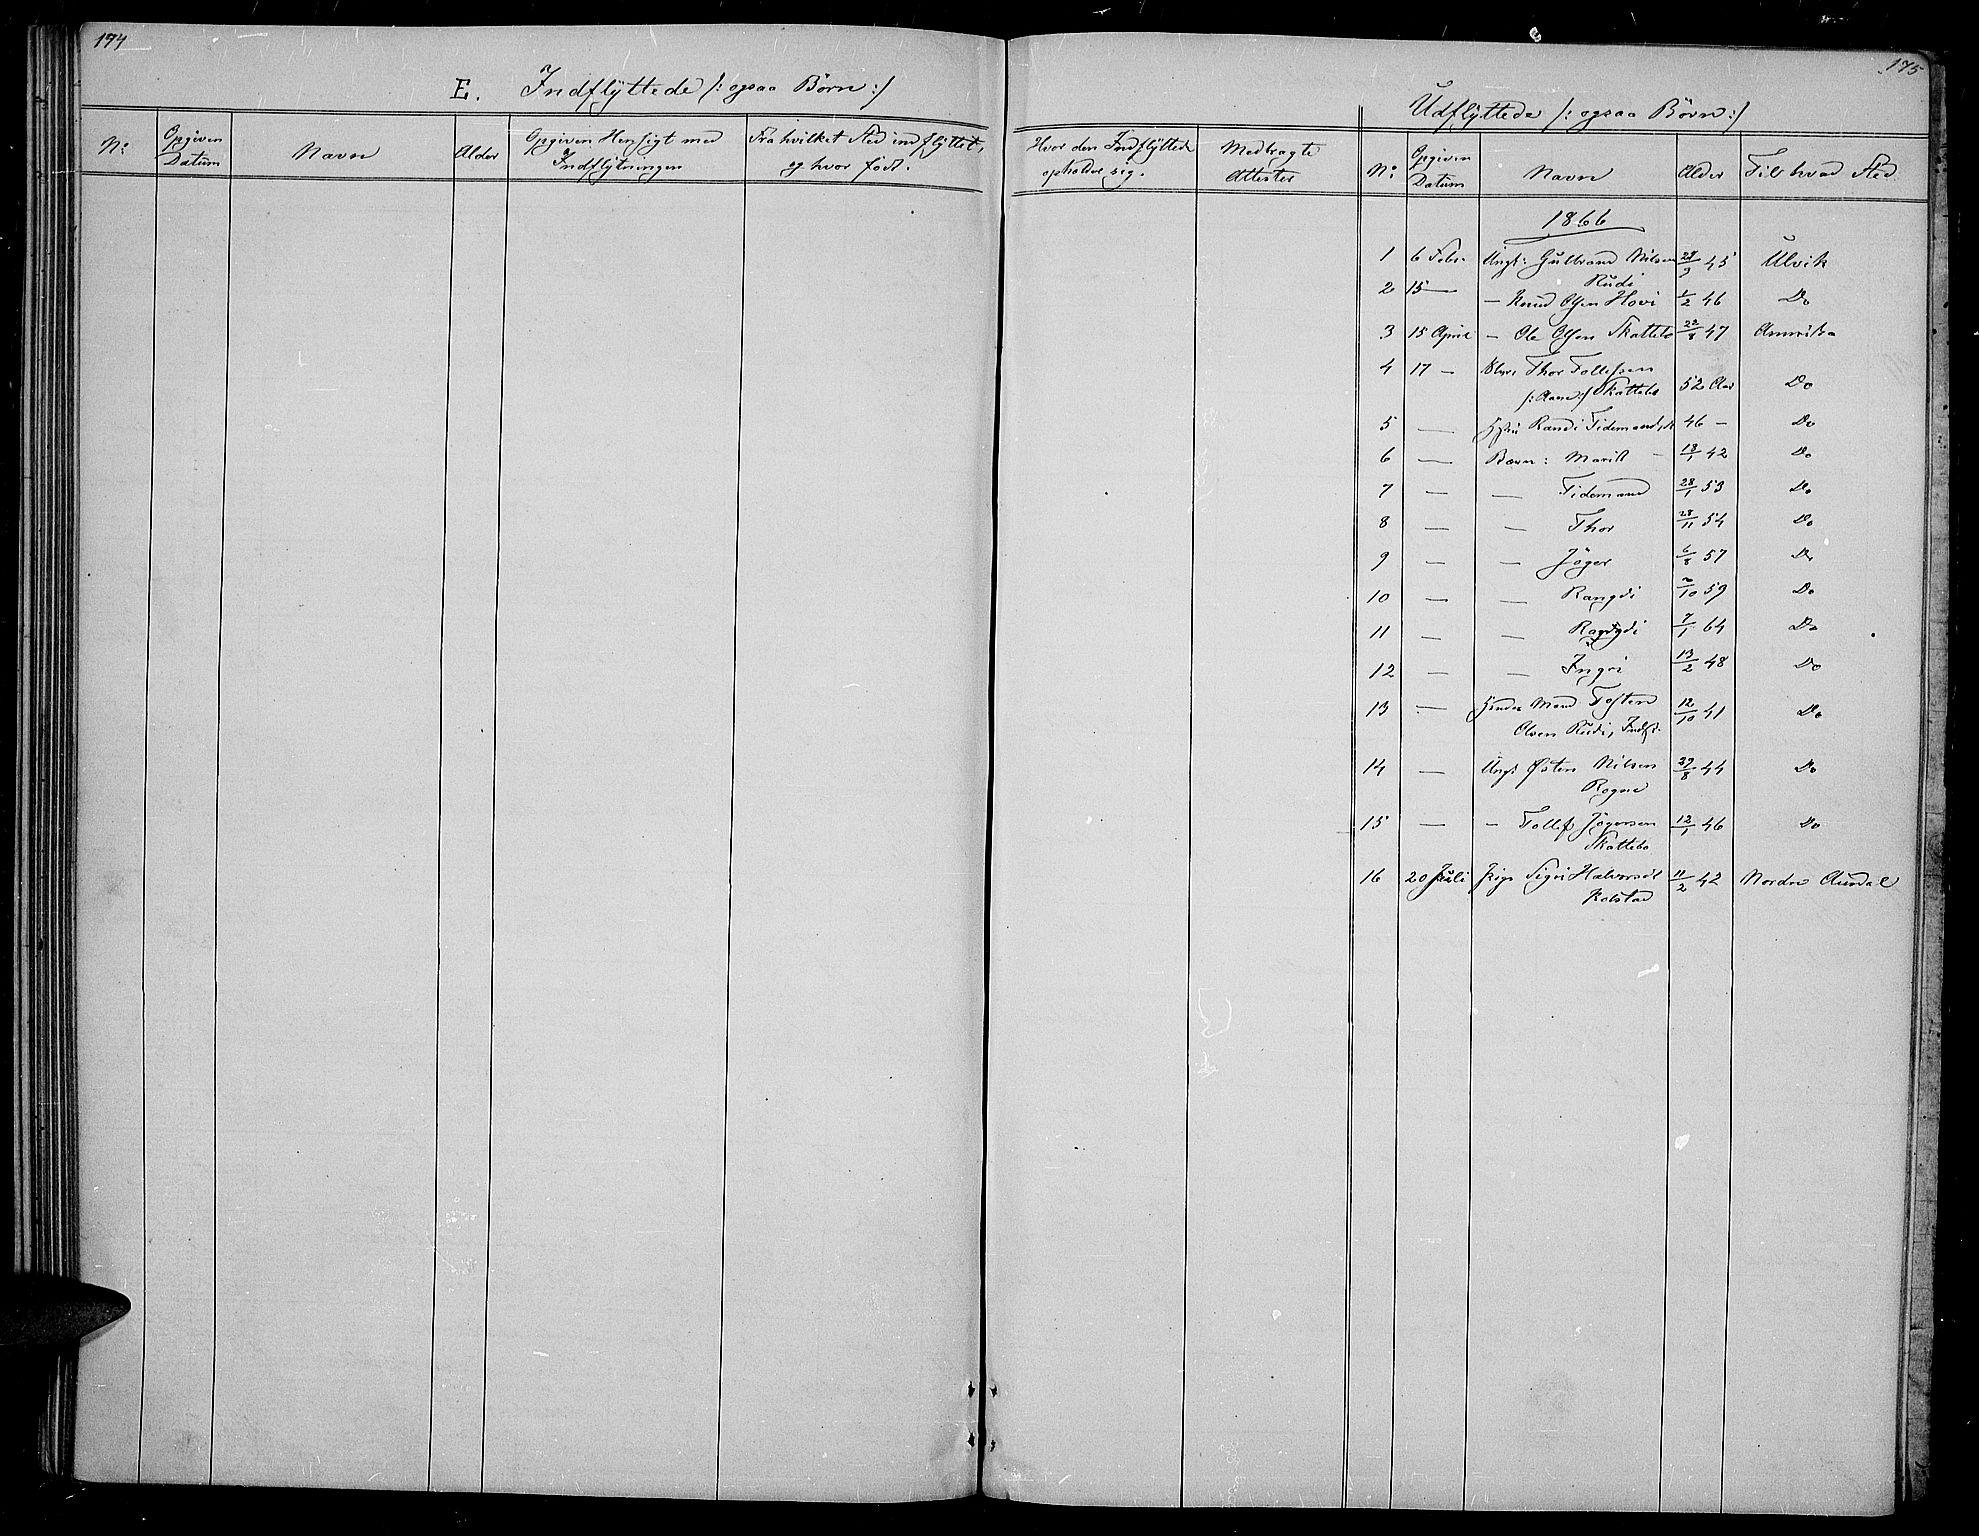 SAH, Øystre Slidre prestekontor, Klokkerbok nr. 3, 1866-1886, s. 174-175